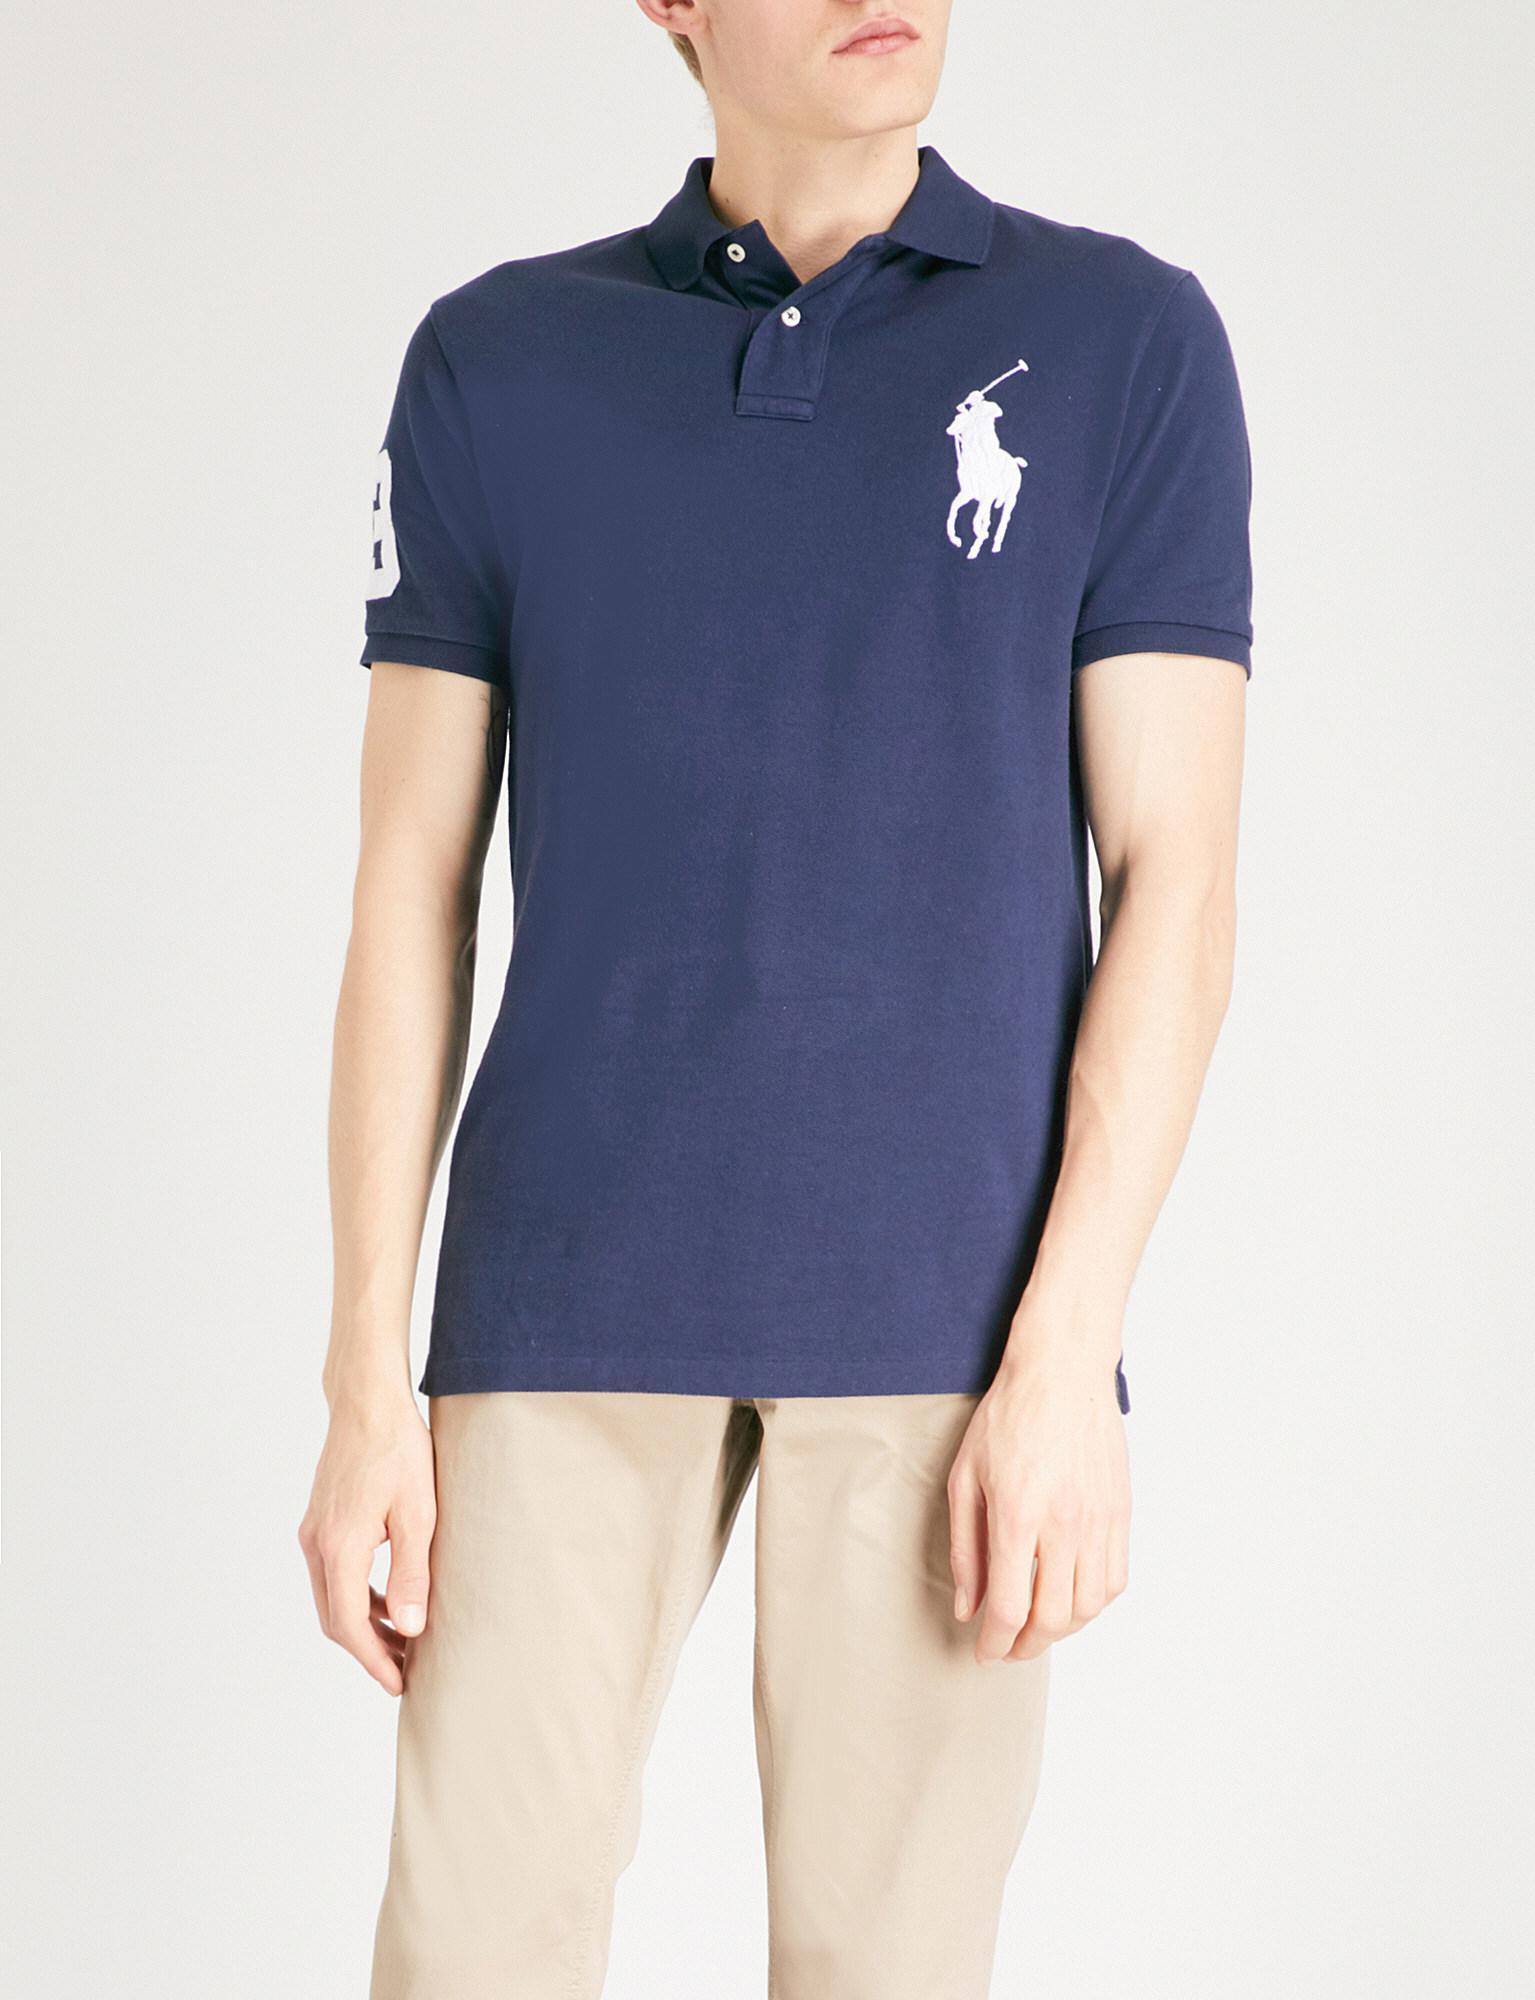 Custom Polo Shirts With Logo Joe Maloy